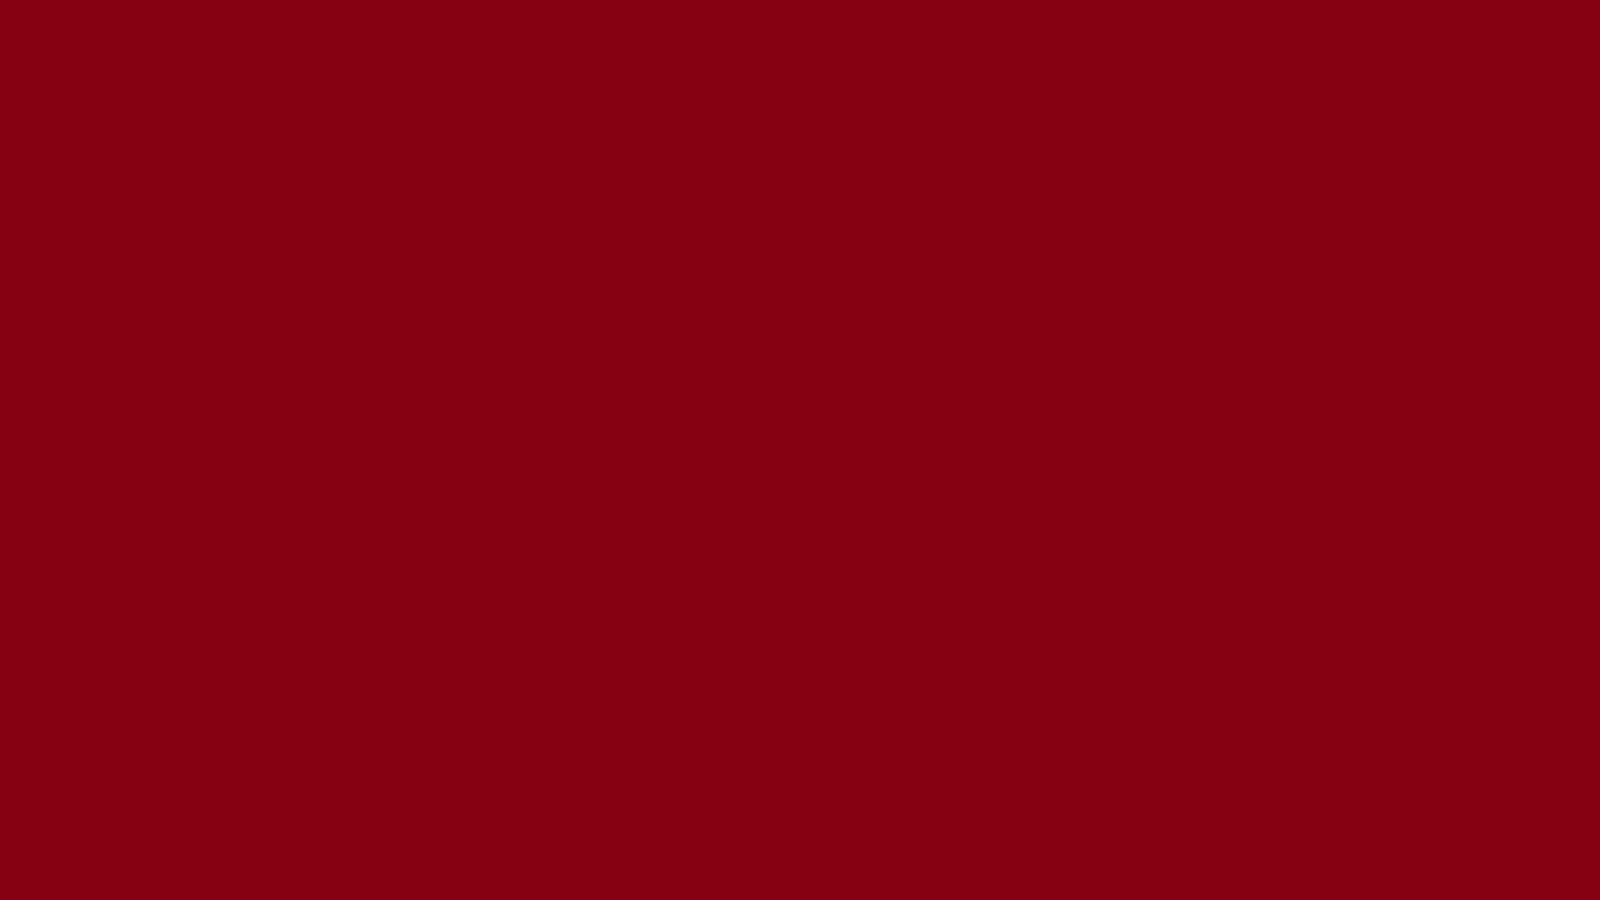 1600x900 Red Devil Solid Color Background